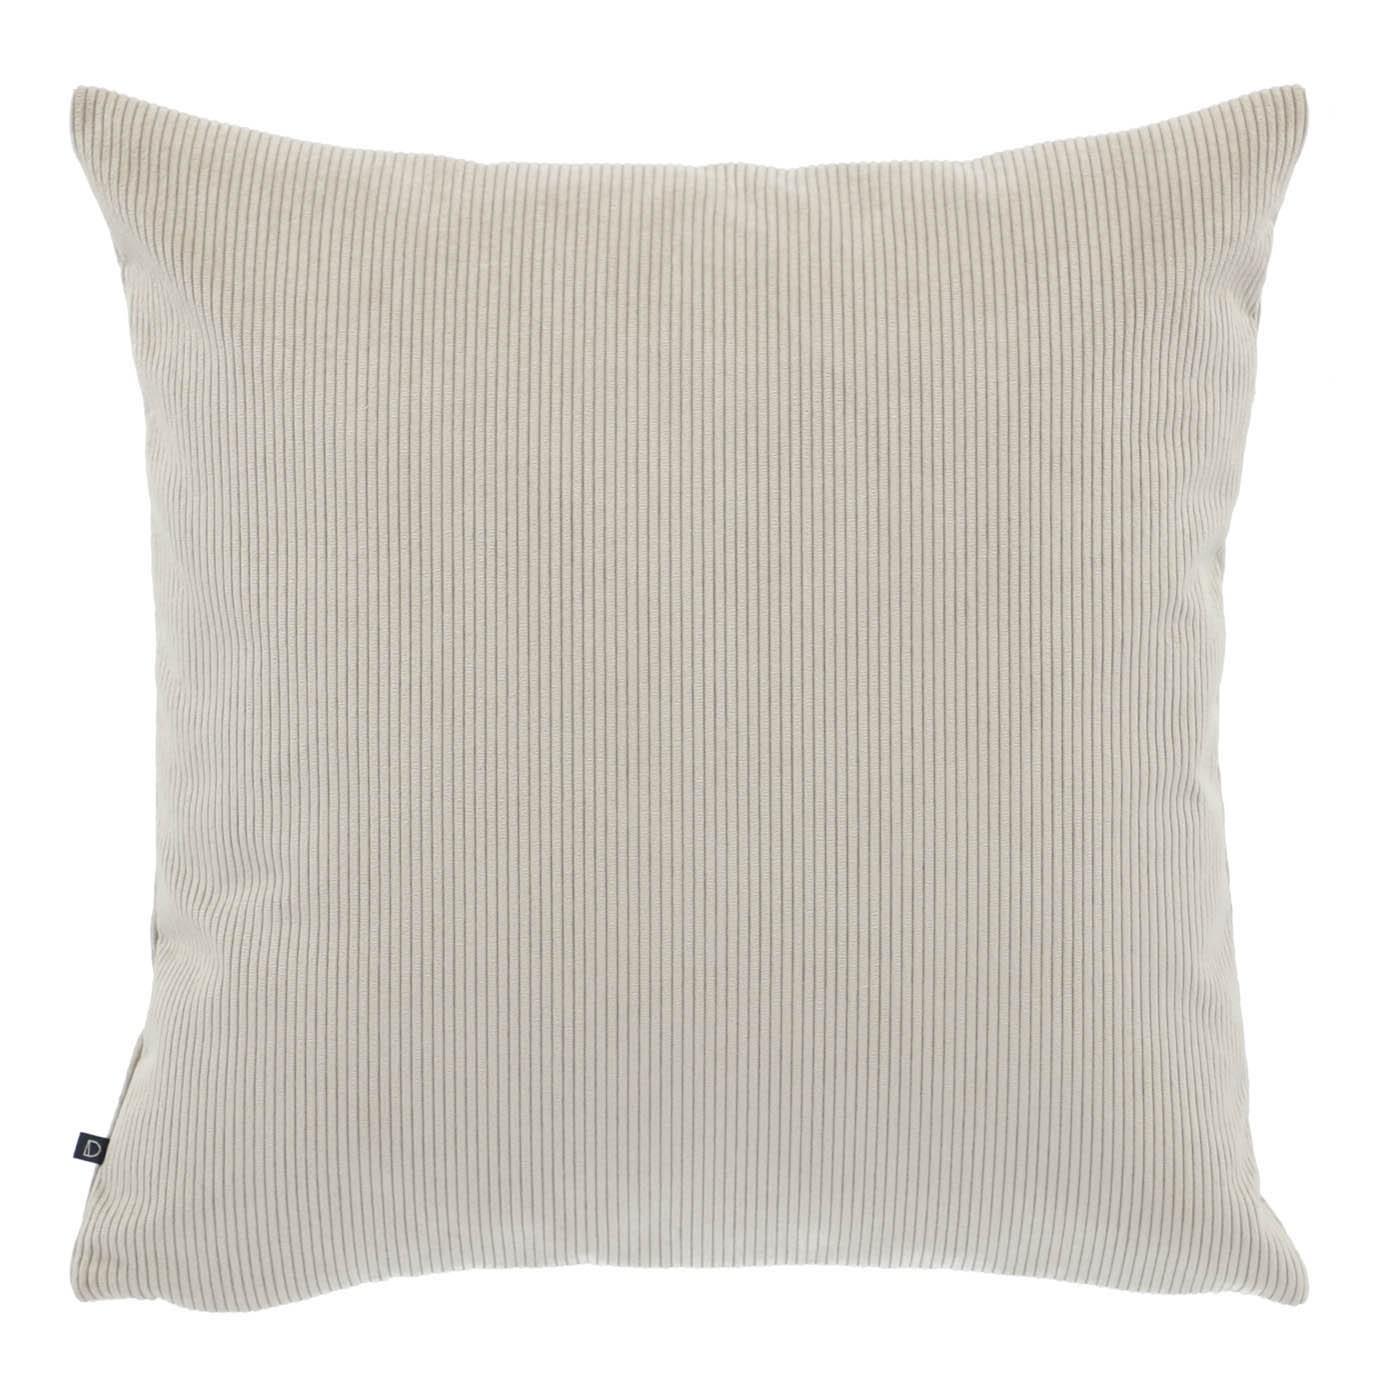 Chelsea Corduroy Fabric Scatter Cushion, Beige